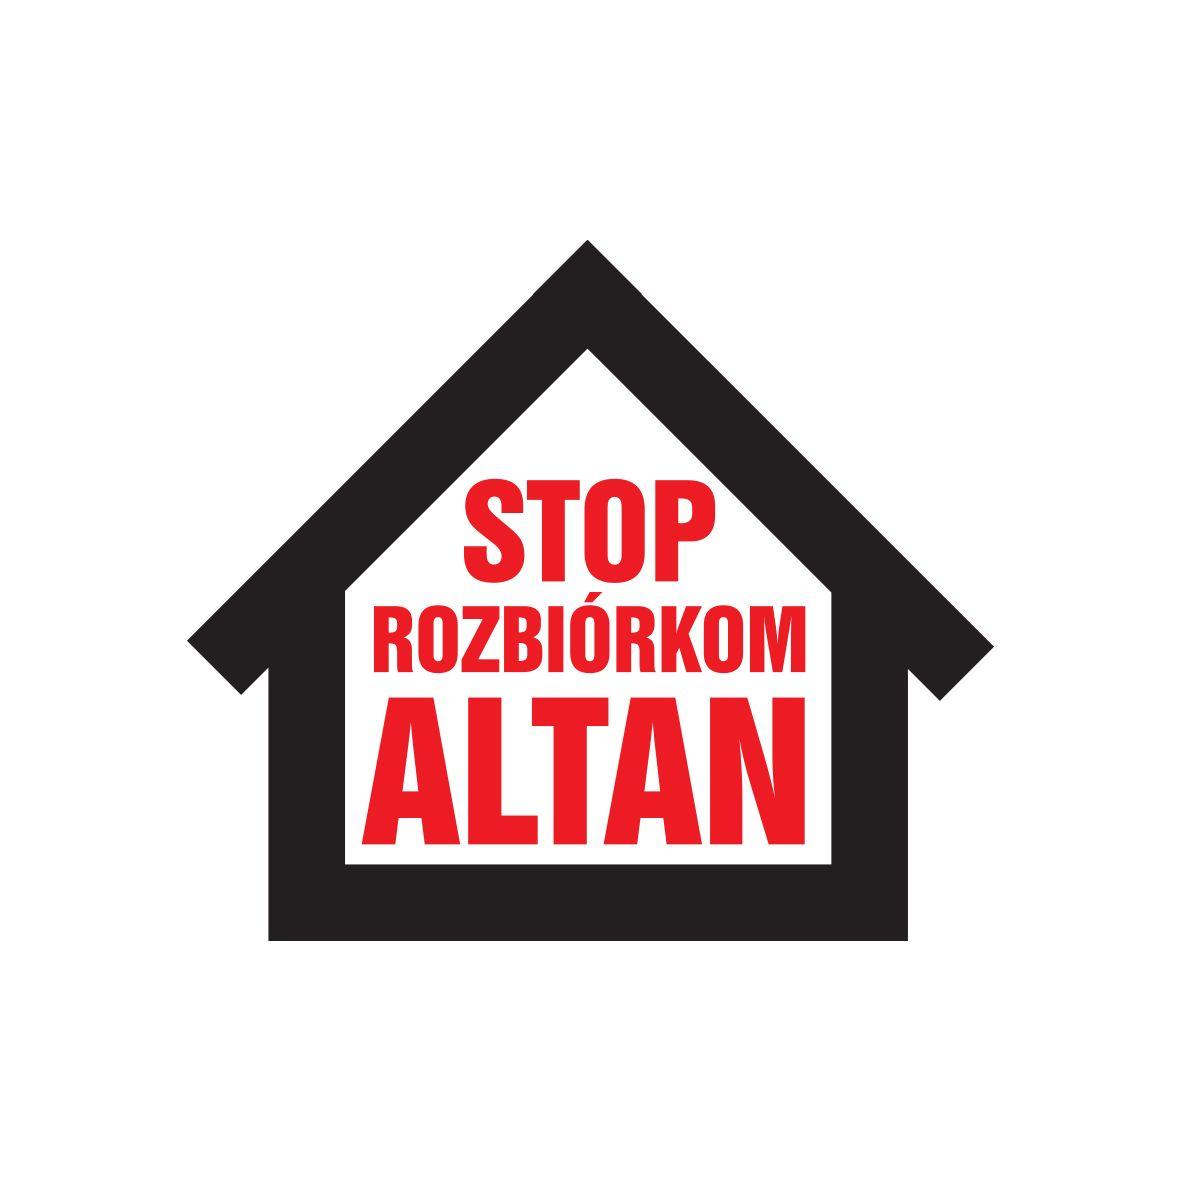 http://pzd.pl/uploads/Stop%20Altany%206%20sierpnia.jpg